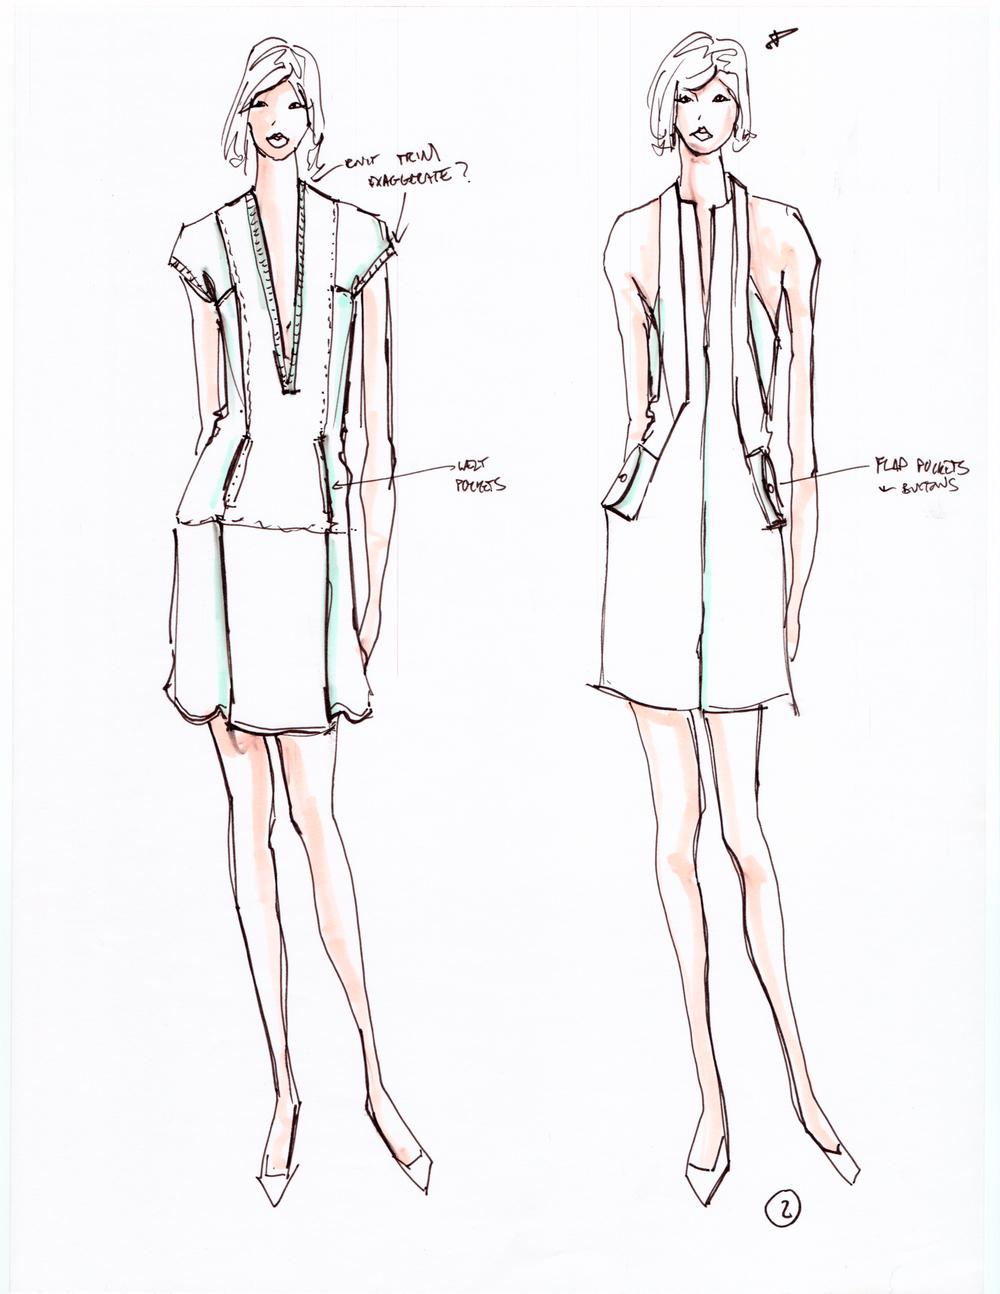 Dresses 3 Sketch 2.jpg